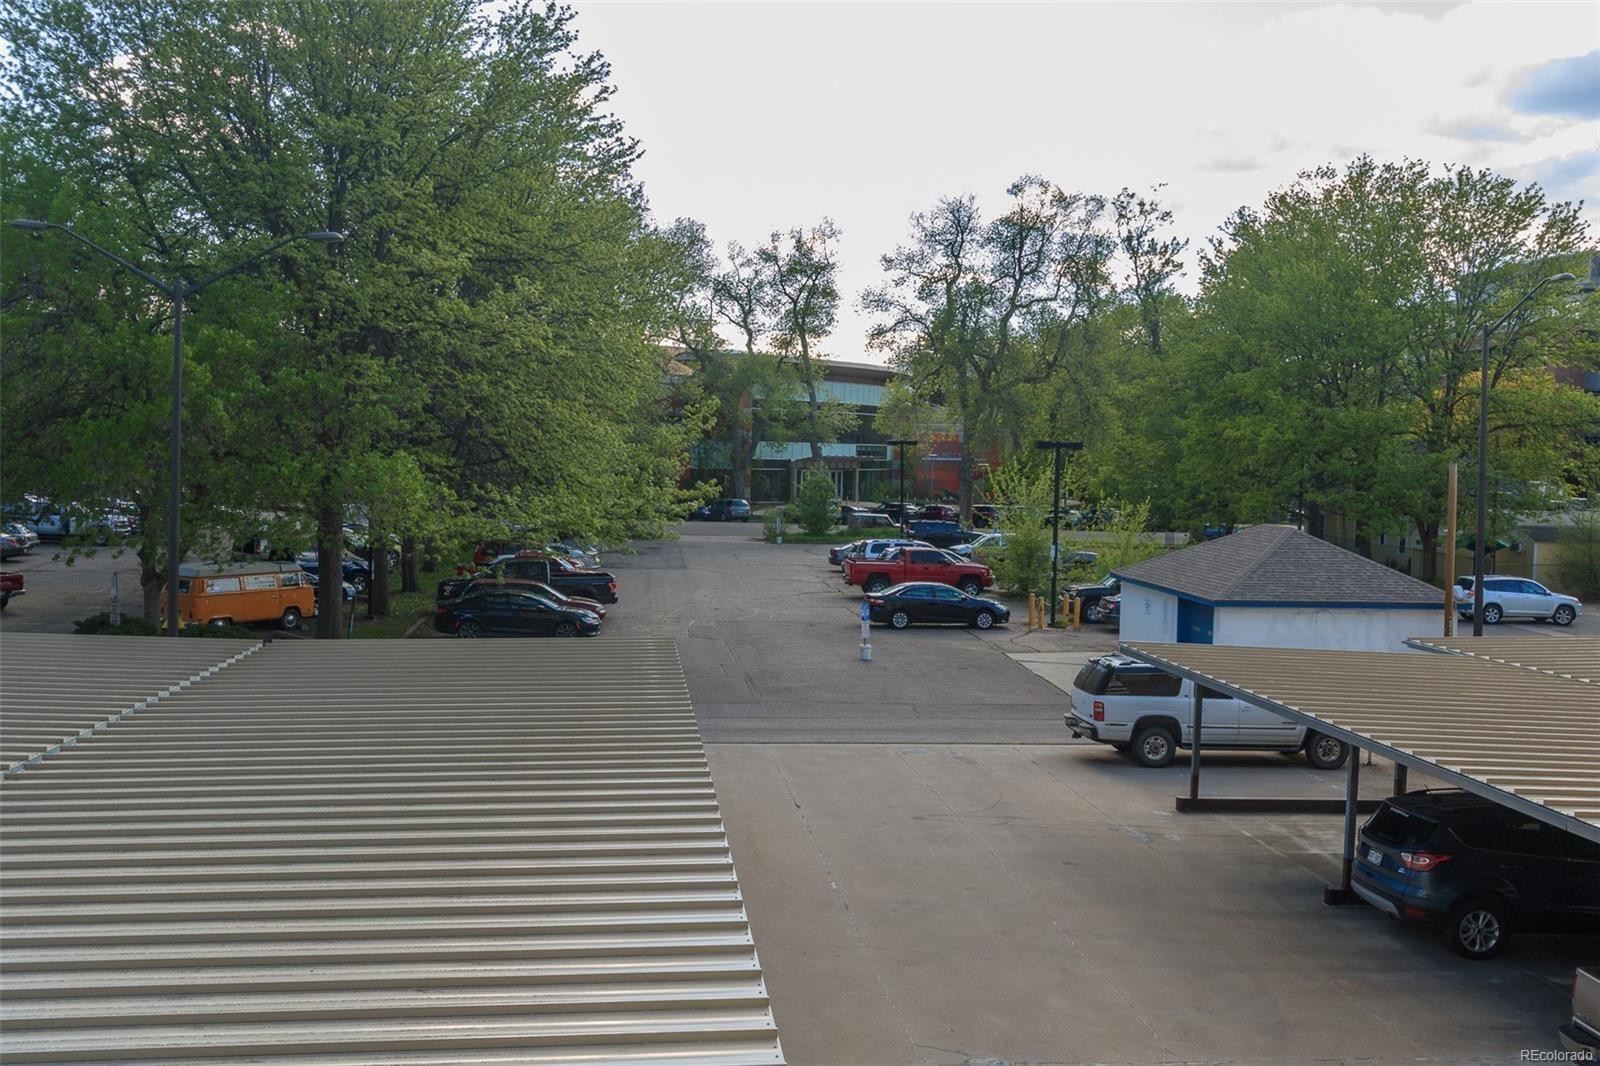 MLS# 2789900 - 1 - 415  S Howes Street, Fort Collins, CO 80521